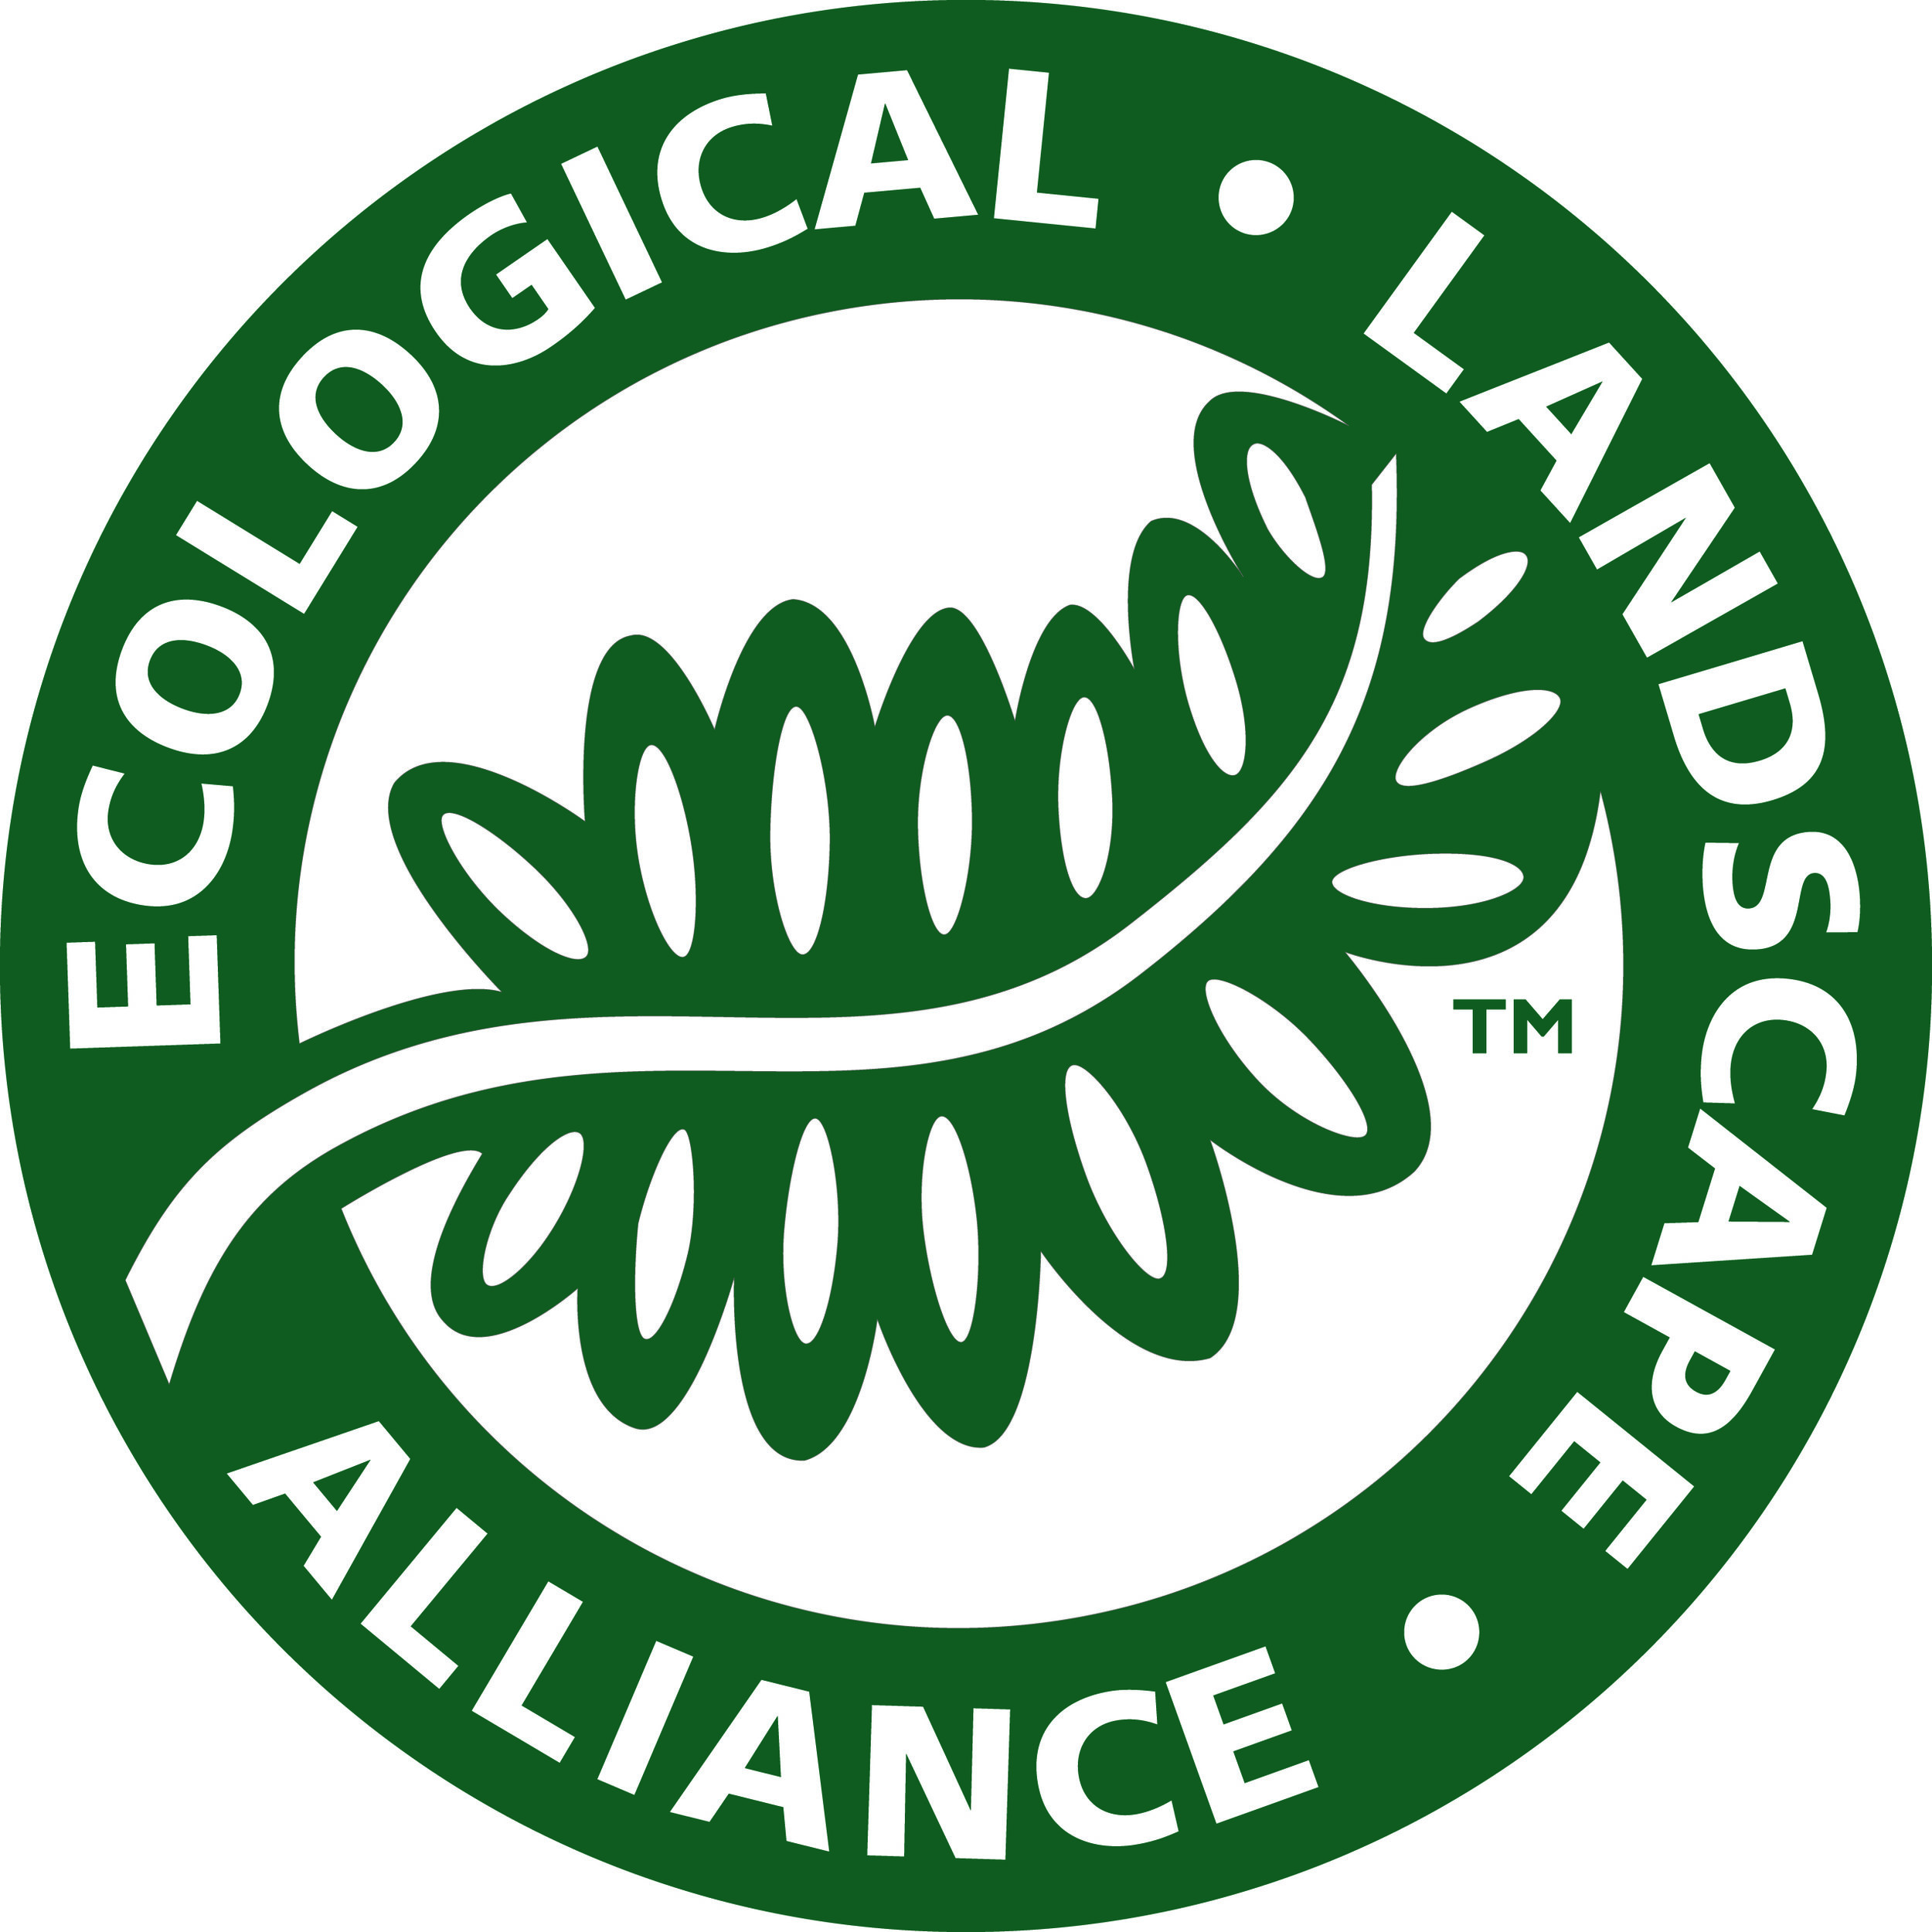 - Ecological Landscape Alliance